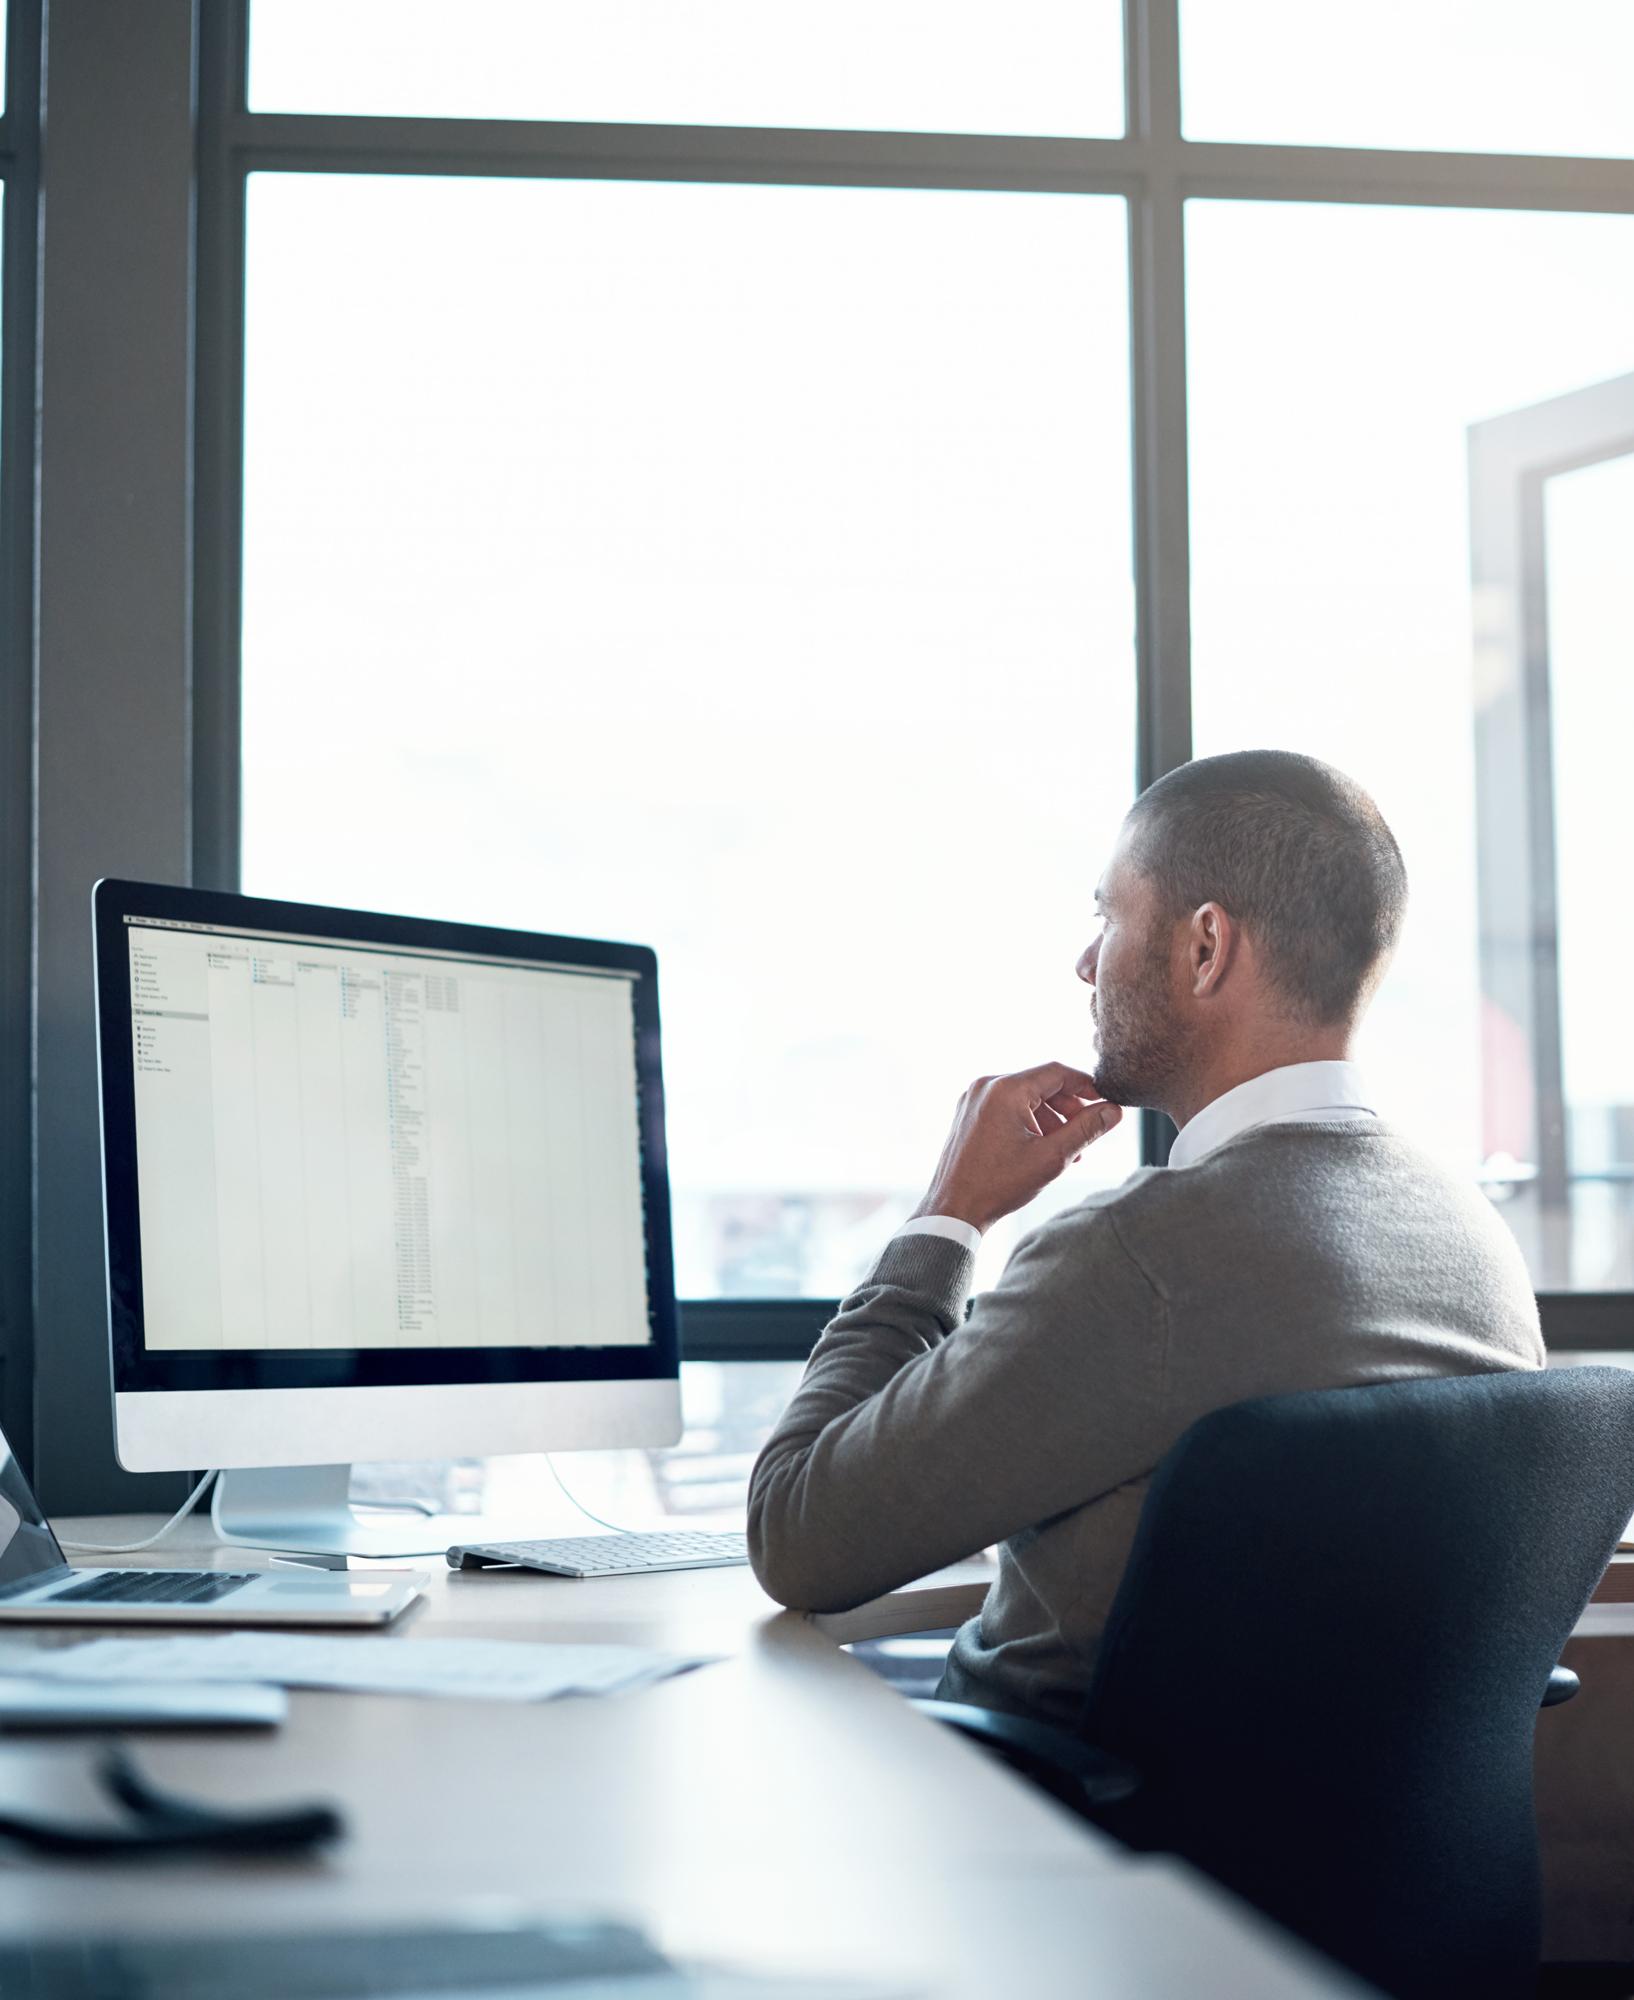 employee using digital workplace